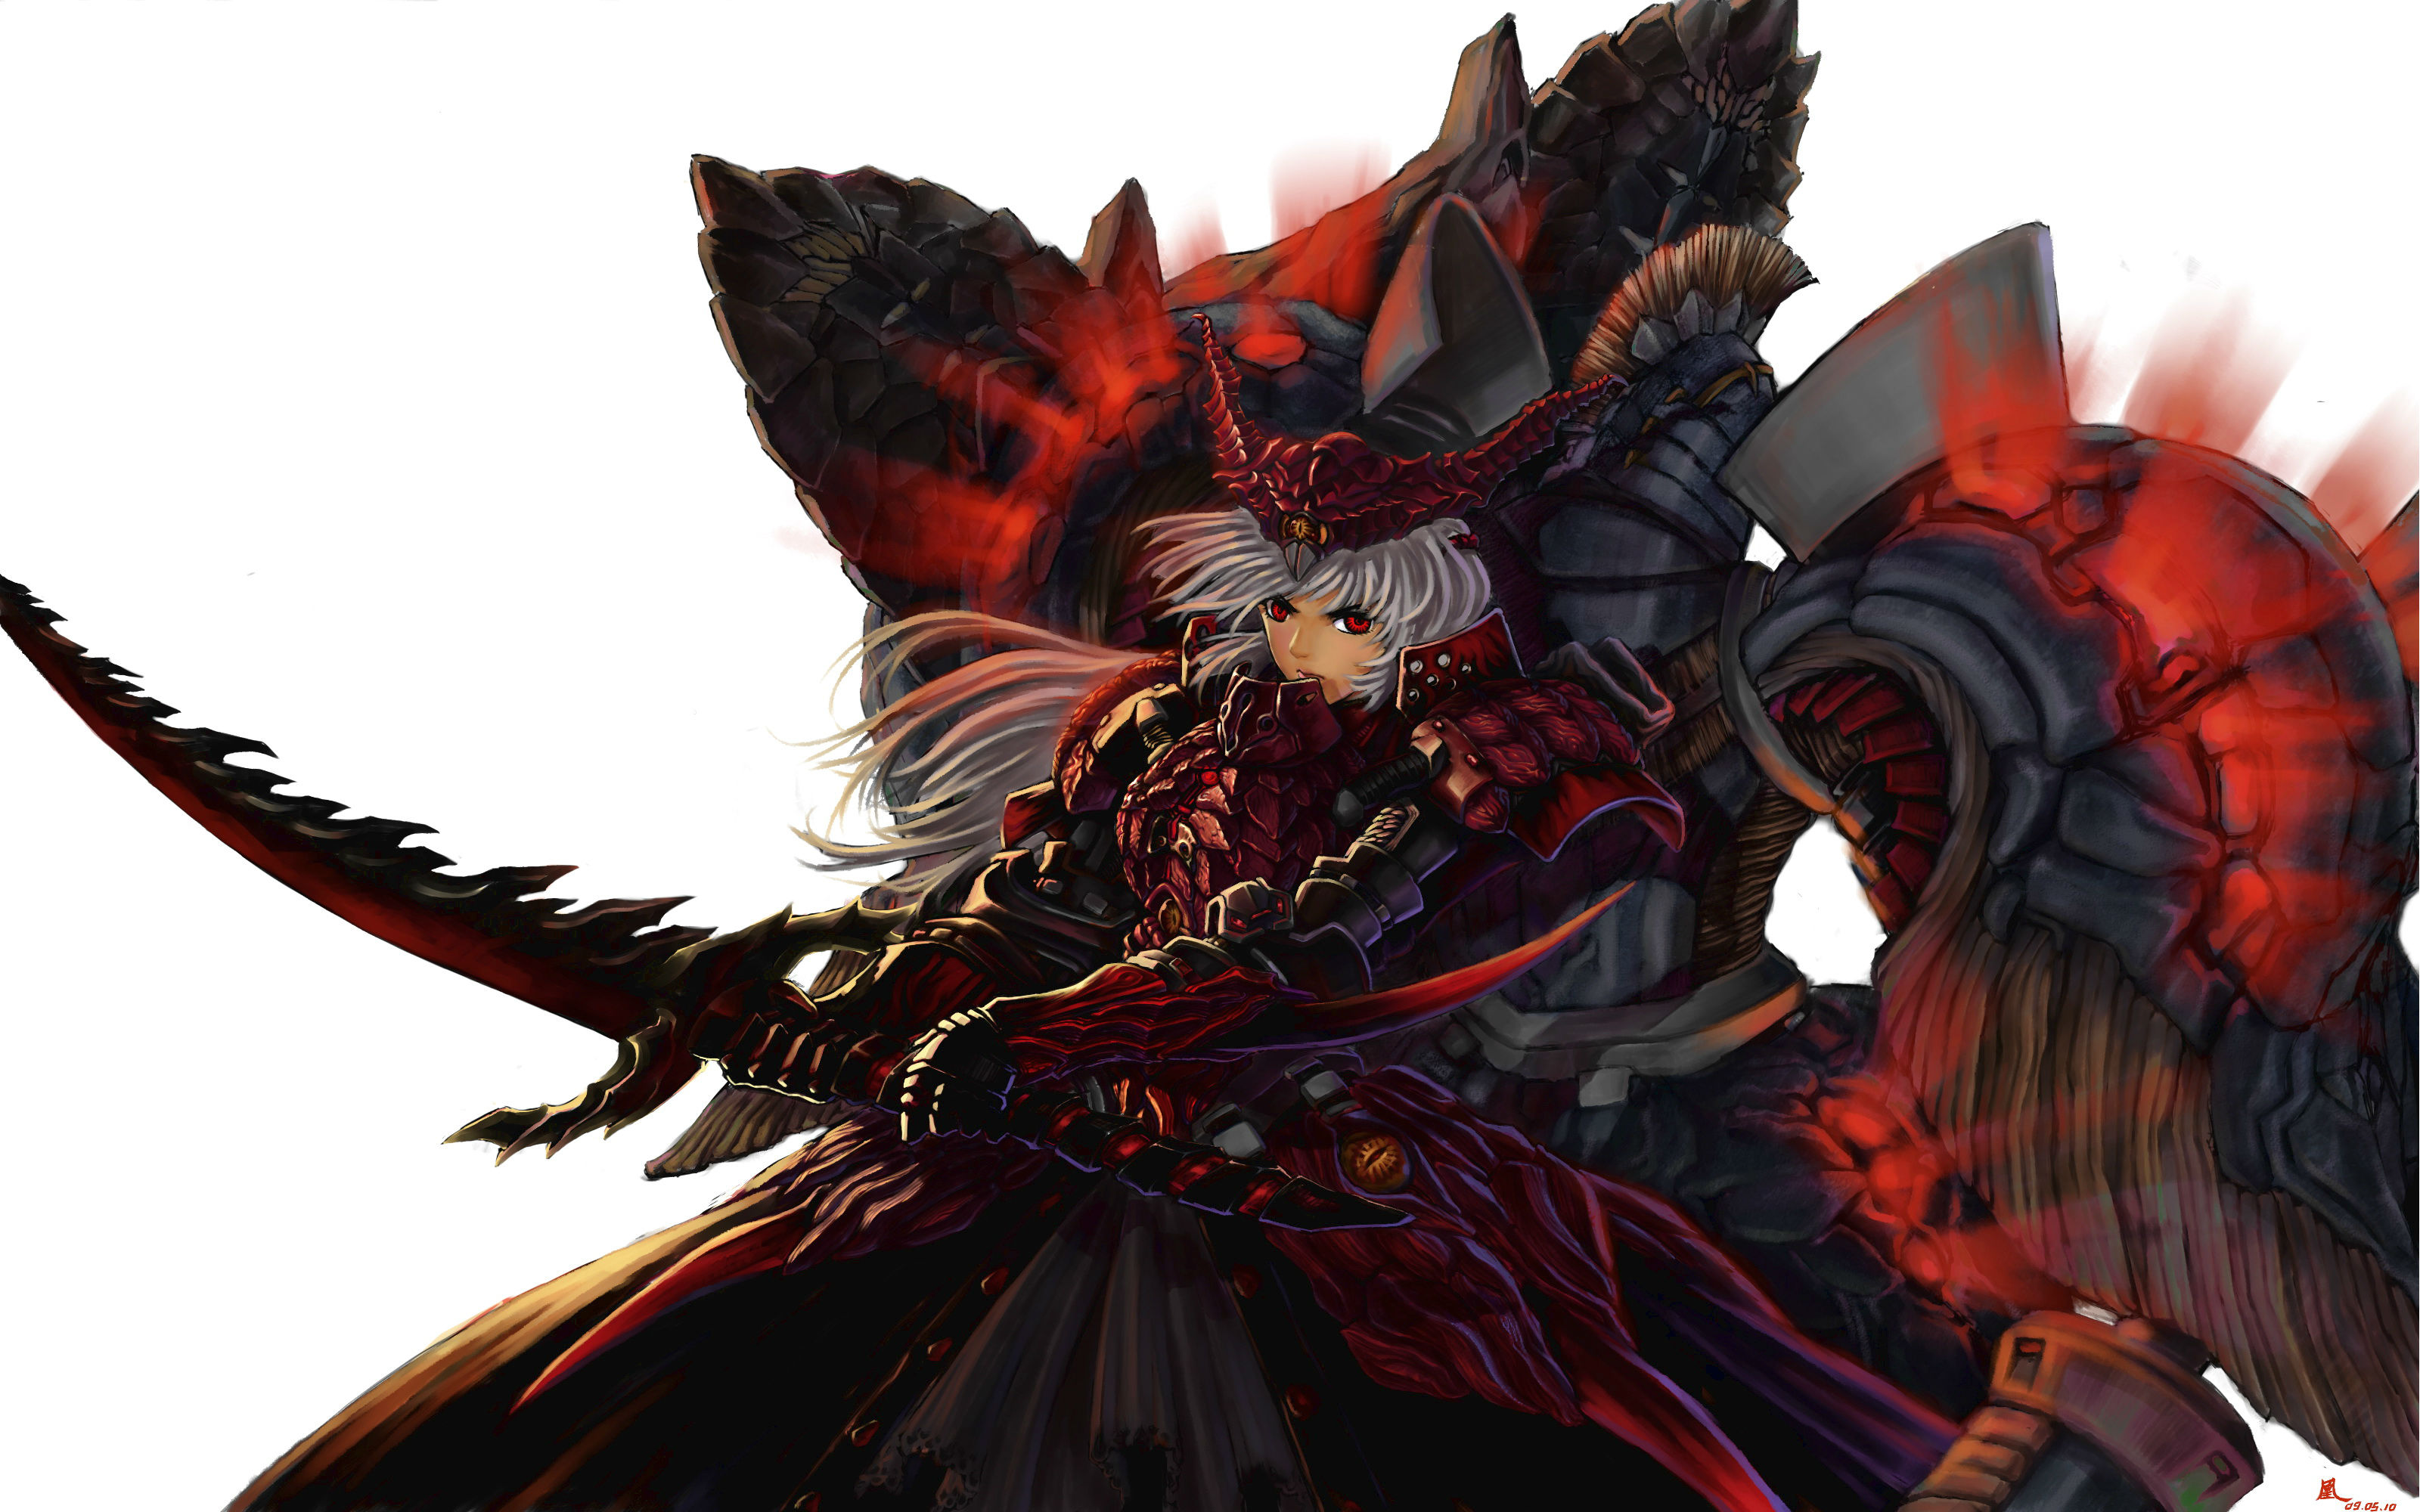 Monster Hunter HD Wallpaper | Background Image | 3200x2000 ...